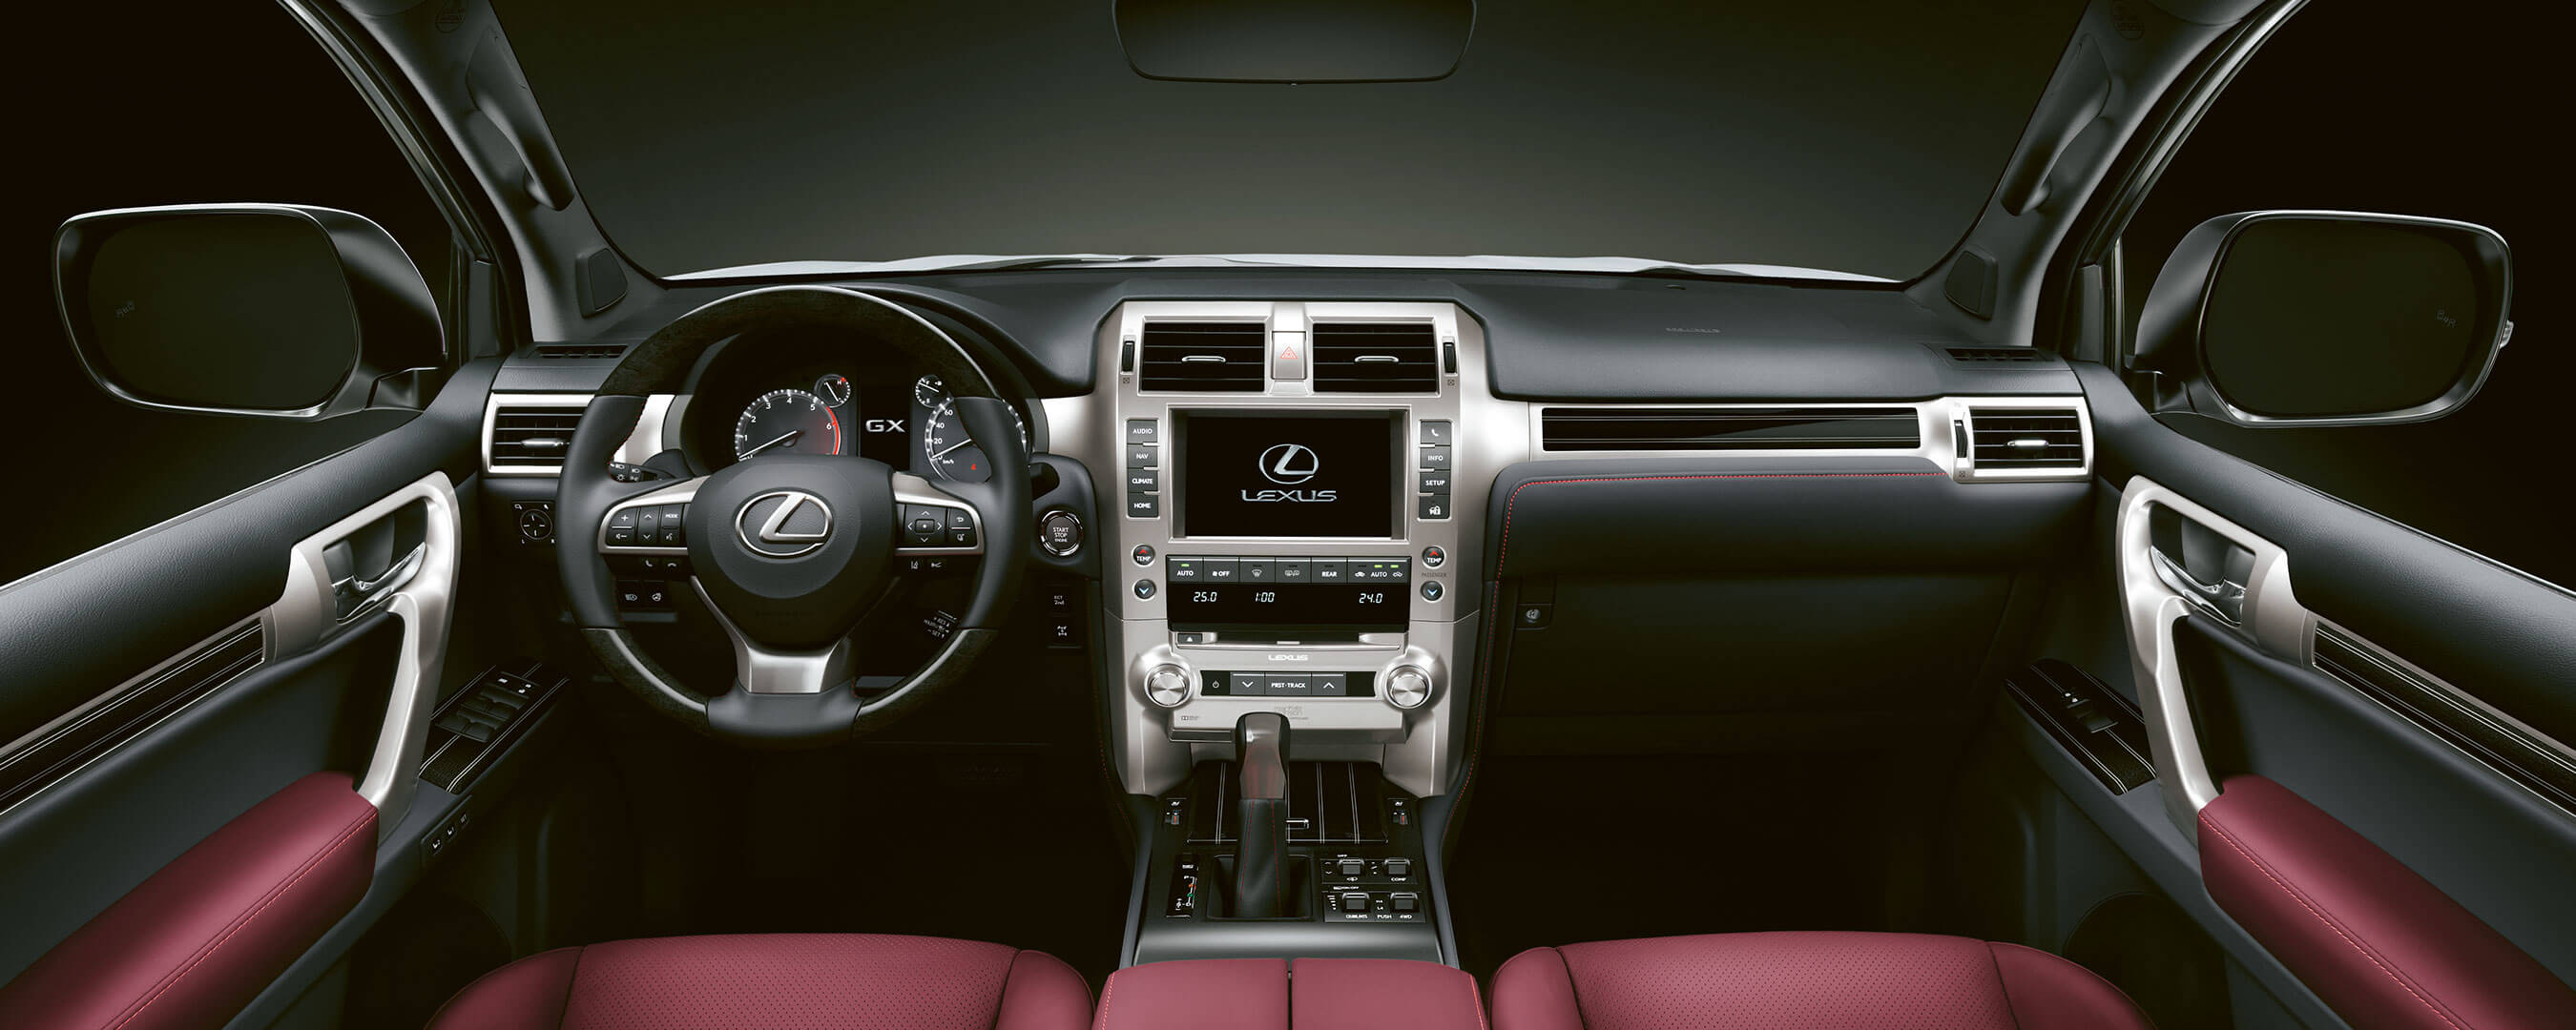 2019 lexus gx experience interior front